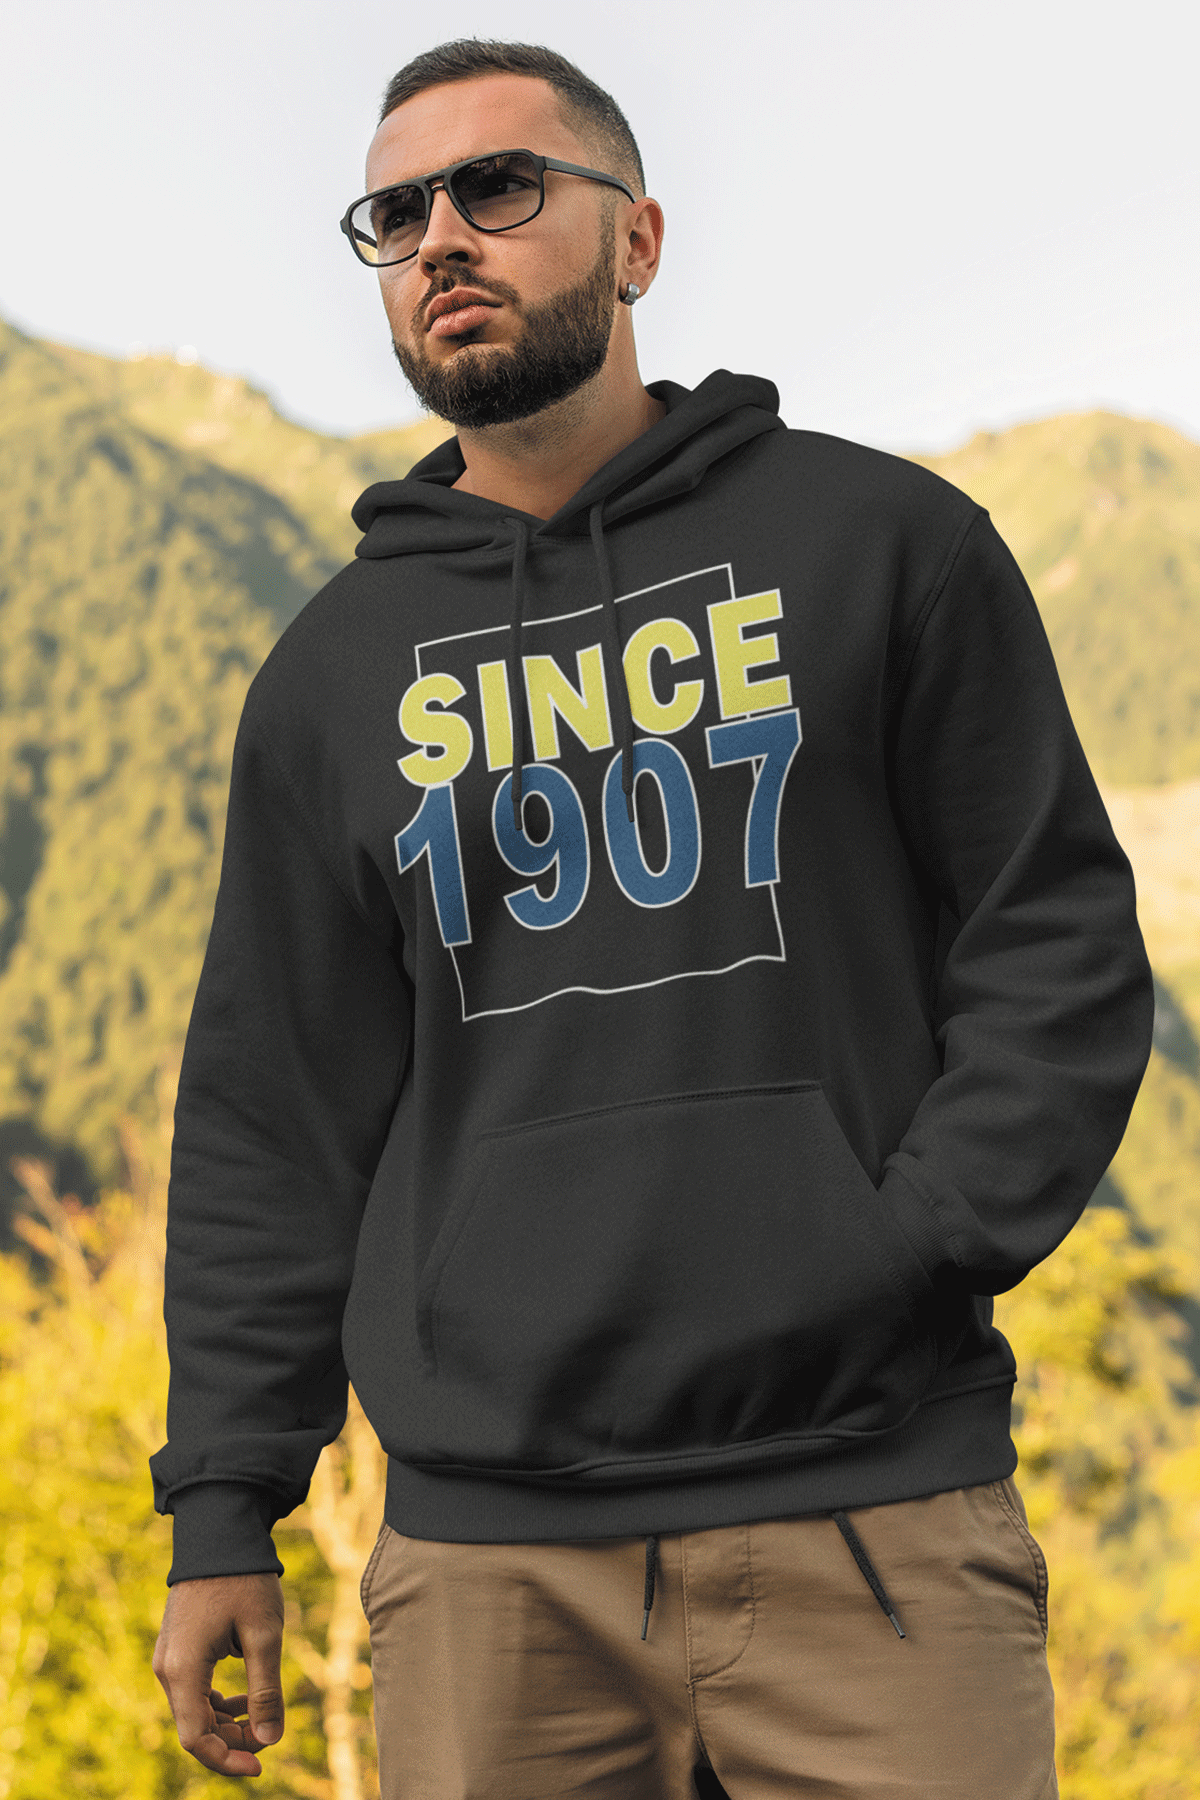 Since 1907 Siyah FB Erkek Kapşonlu Sweatshirt - Hoodie